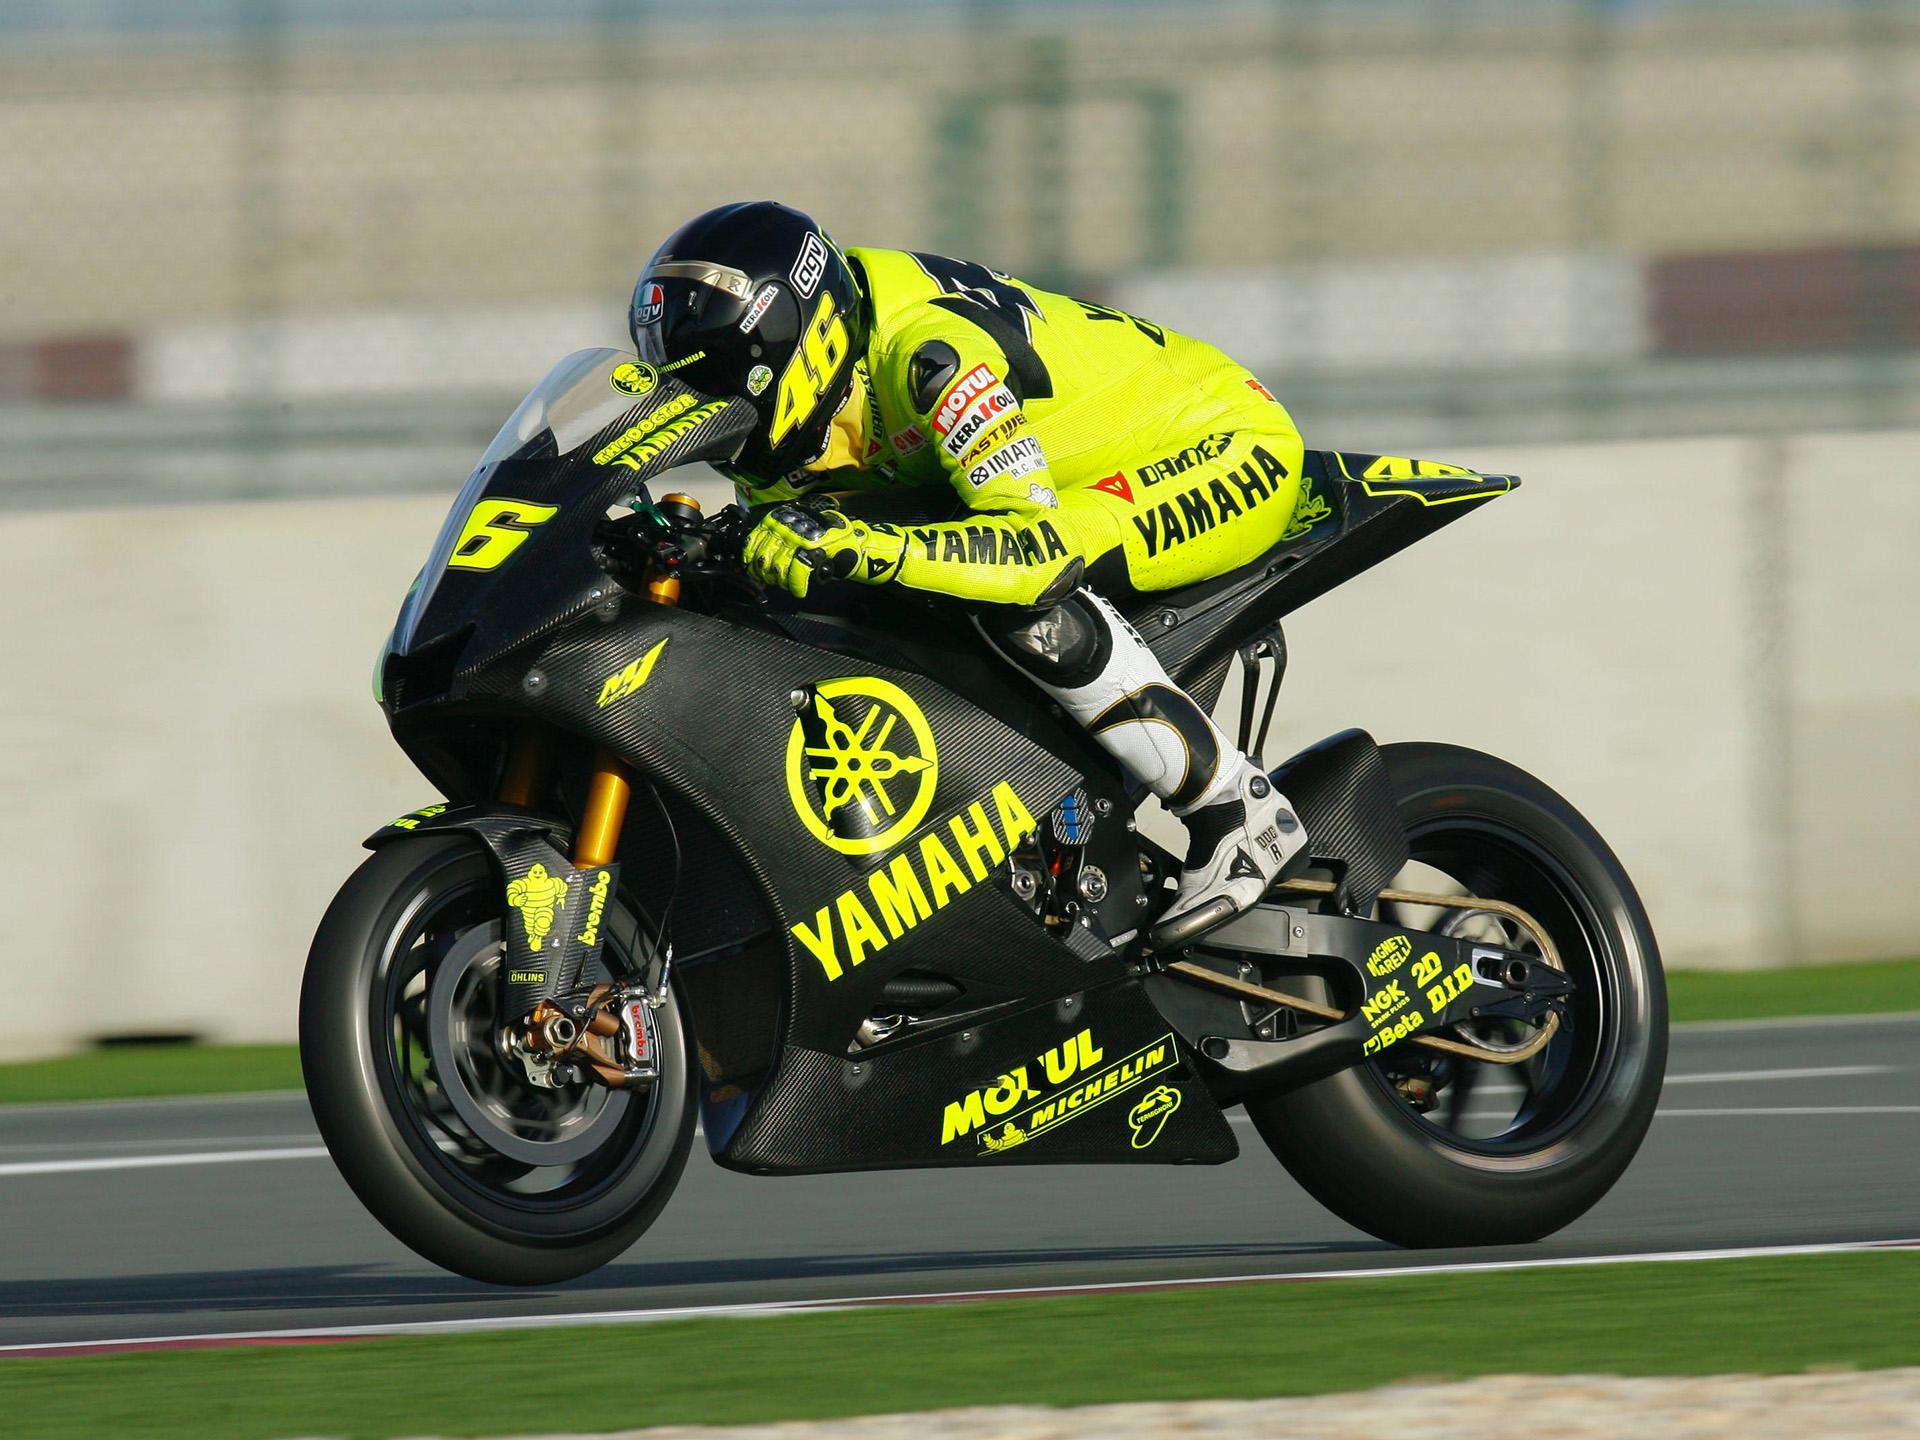 Yamaha Yzr M Mp Pic